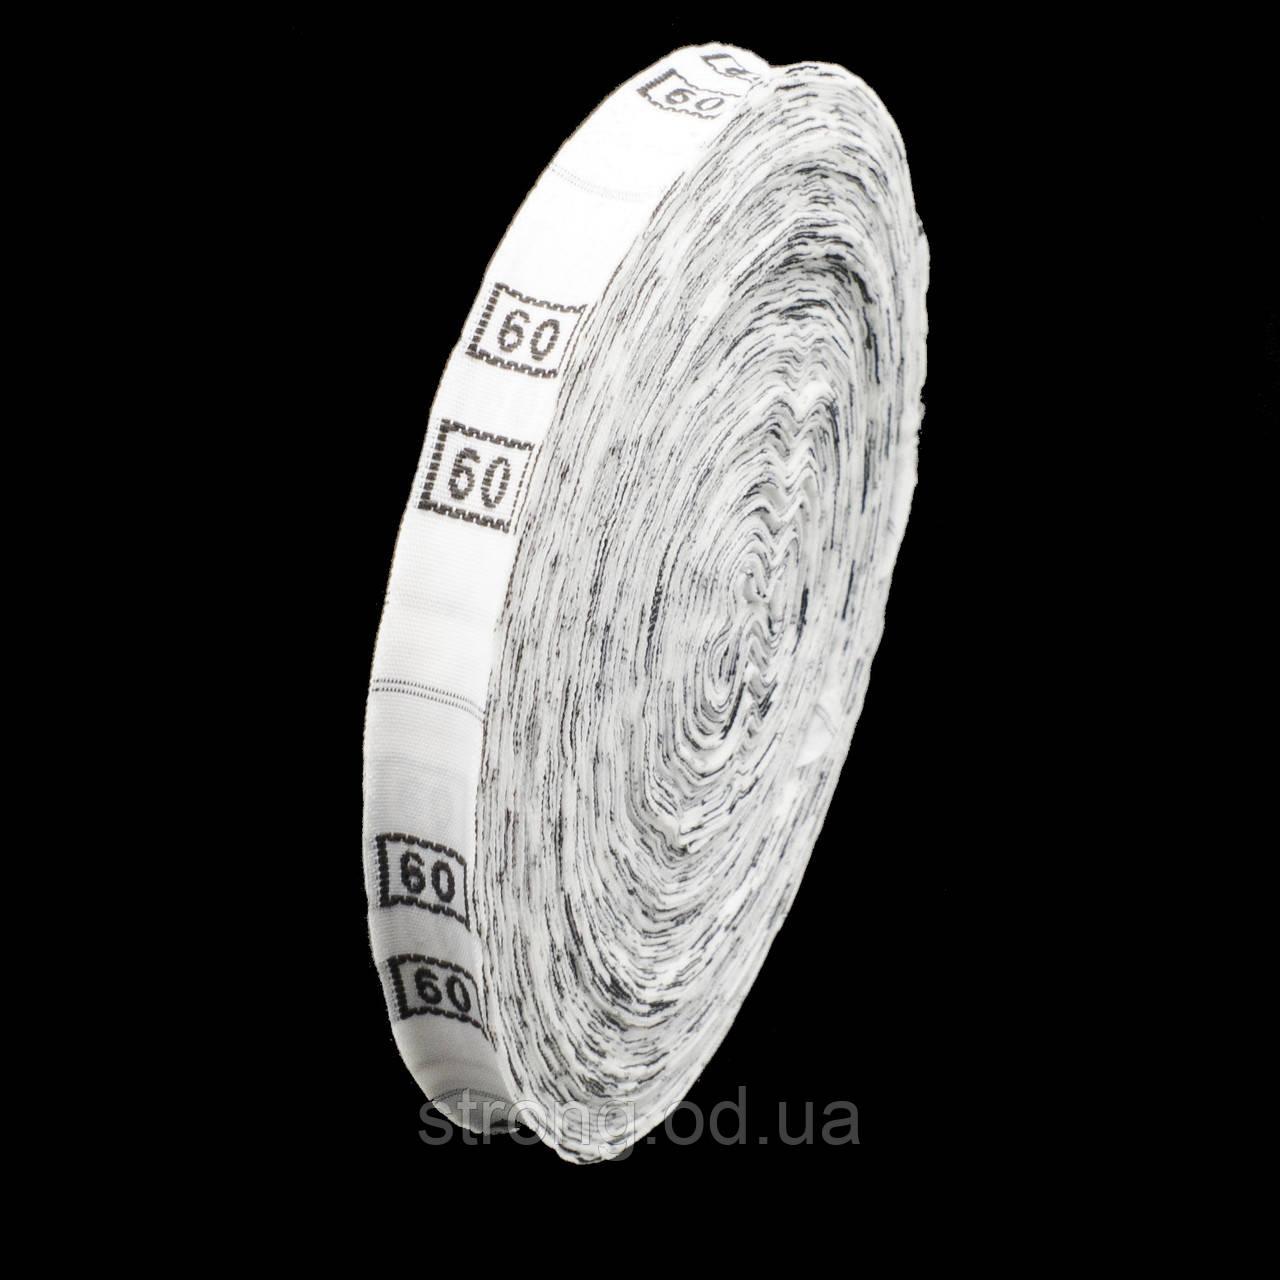 Размерник тканевый №58 960шт. Белый